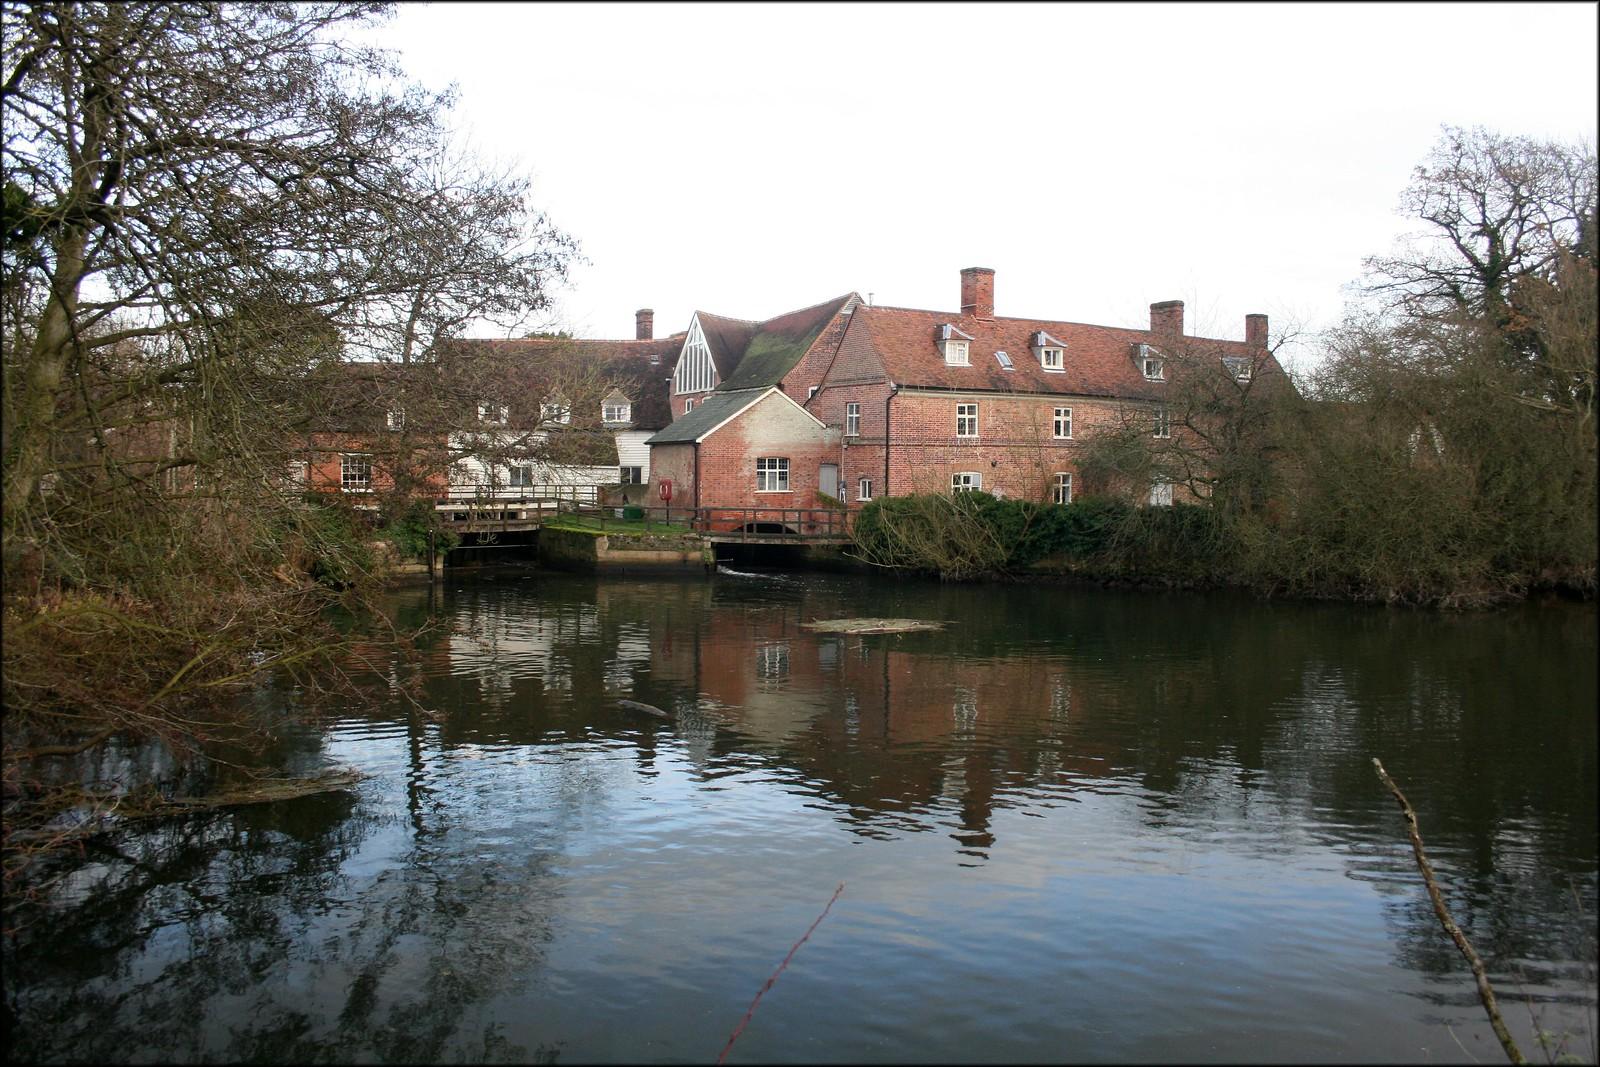 The River Stour near Manningtree